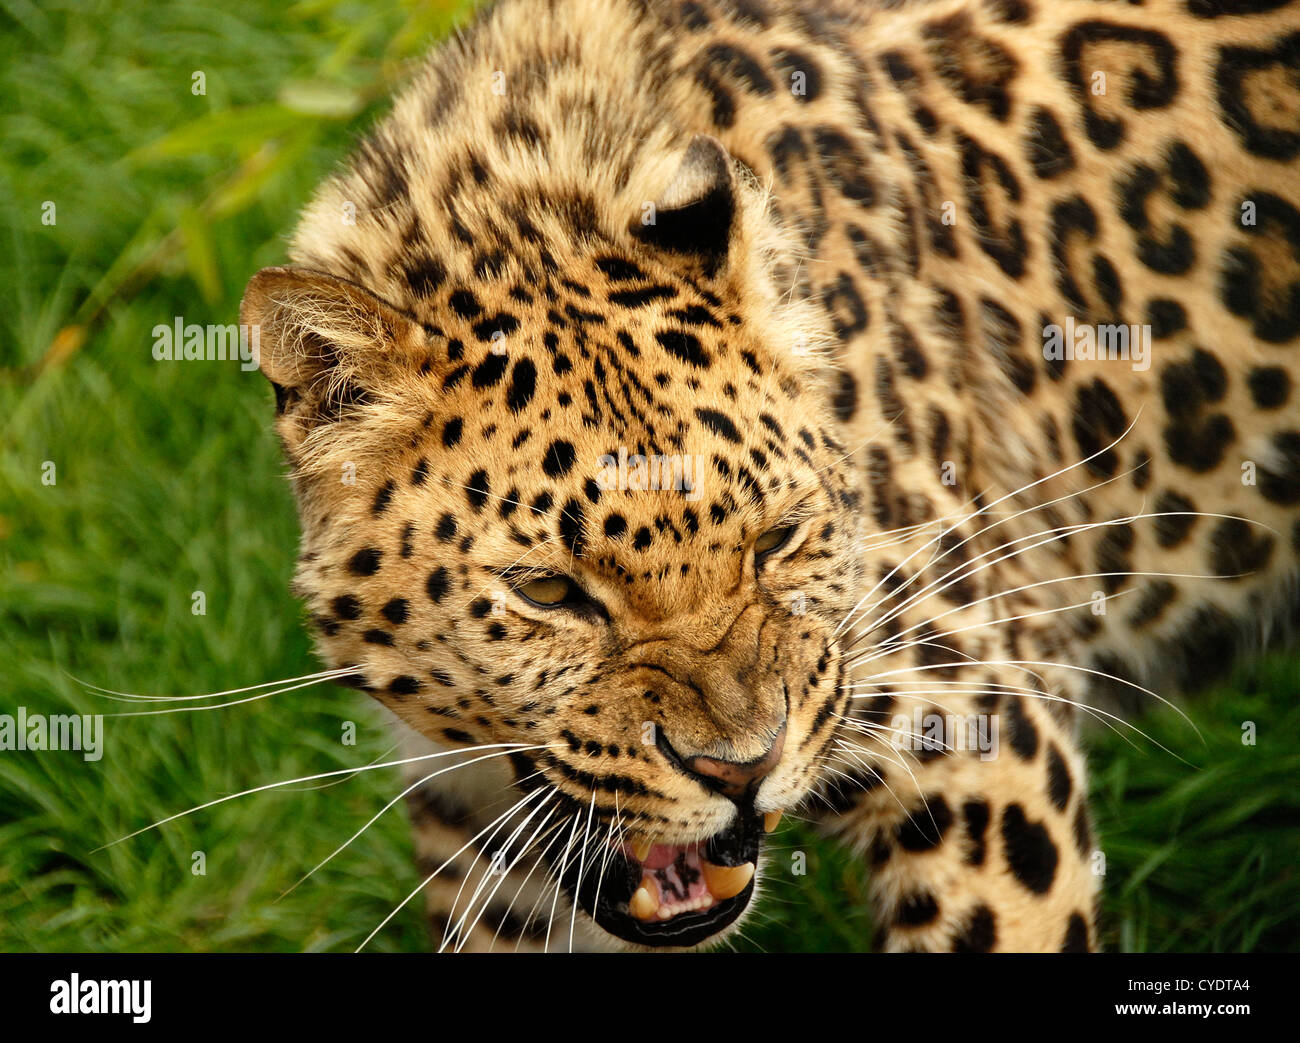 Close up Amur Leopard snarling - Stock Image